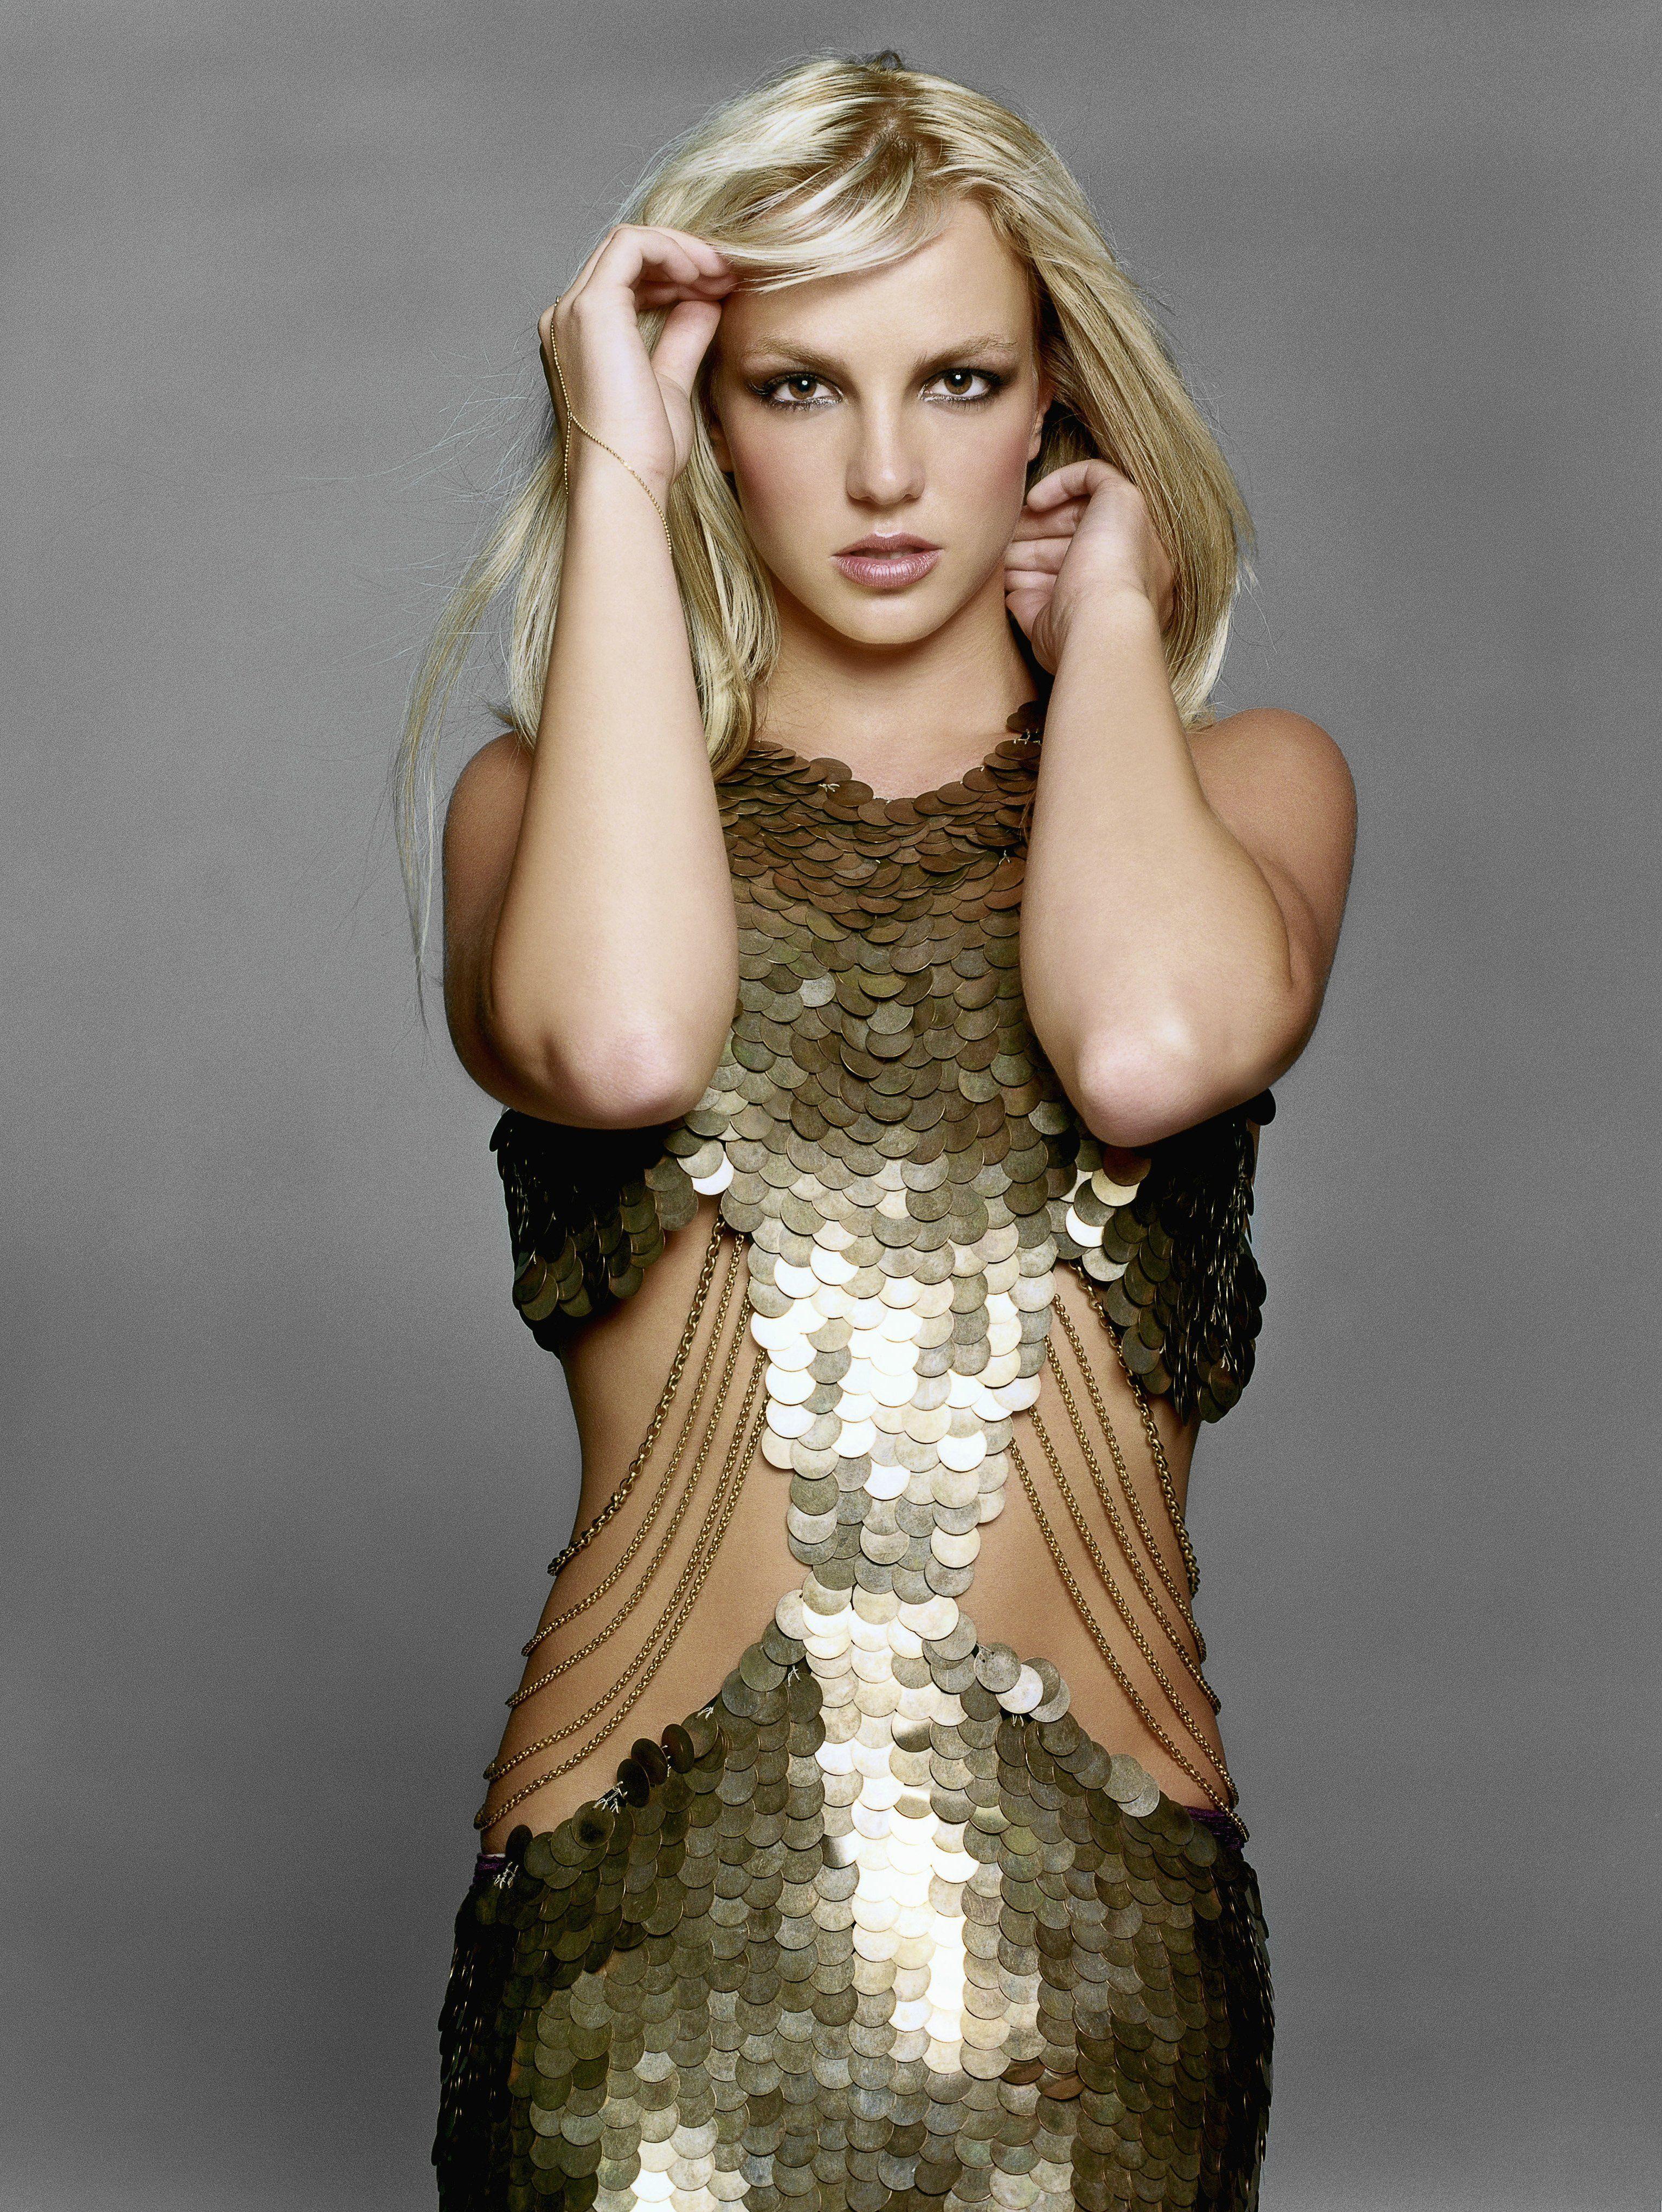 Britney Spears Gold Dress